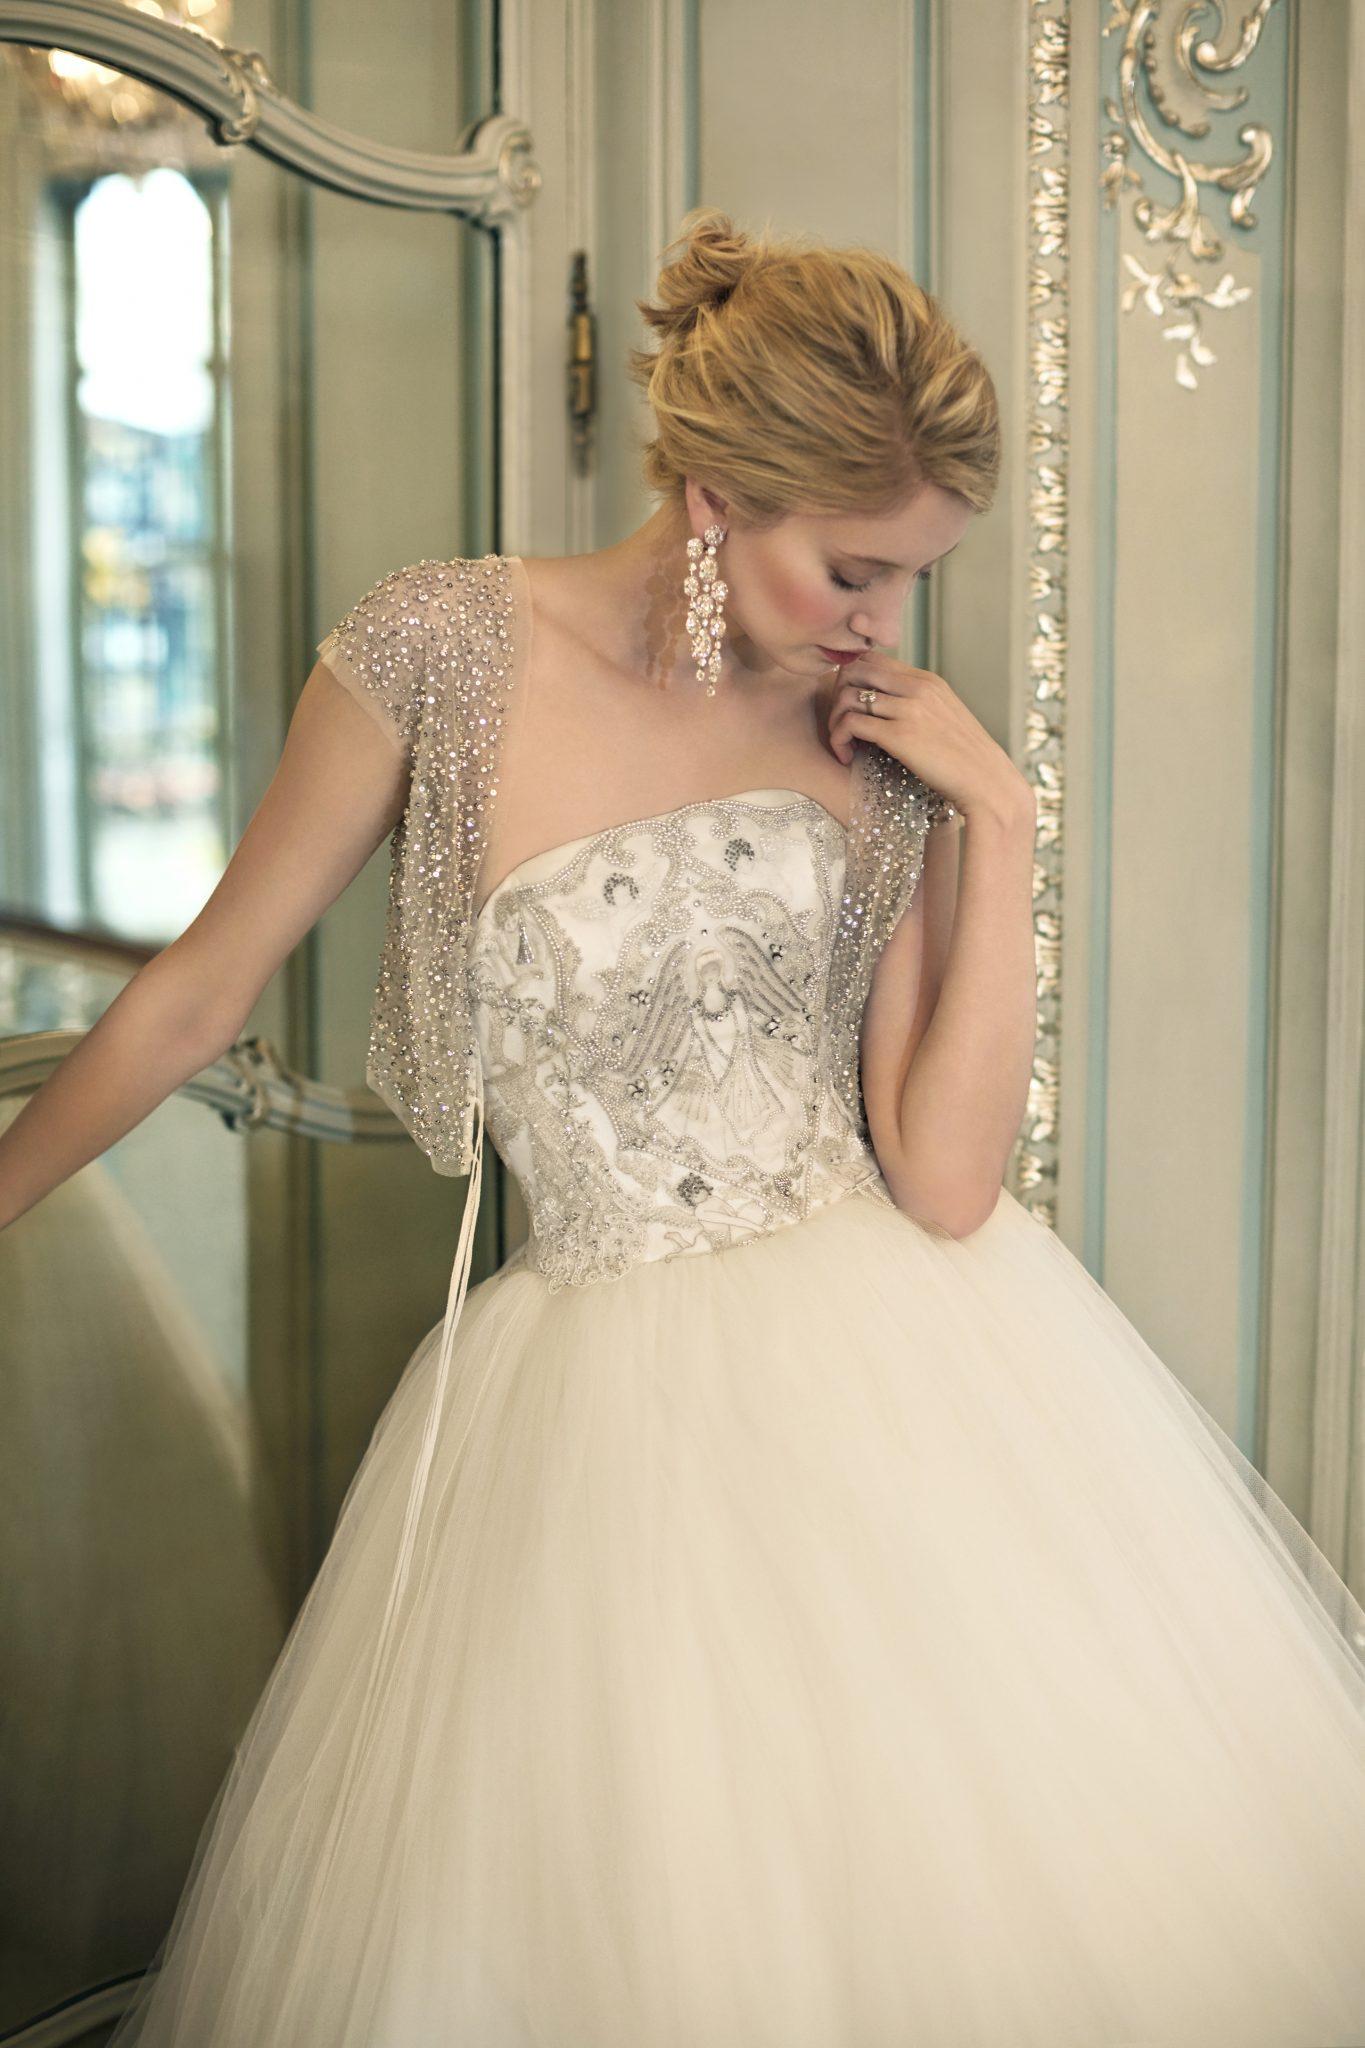 Phillipa-Lepley-Couture-Wedding-Dress-London